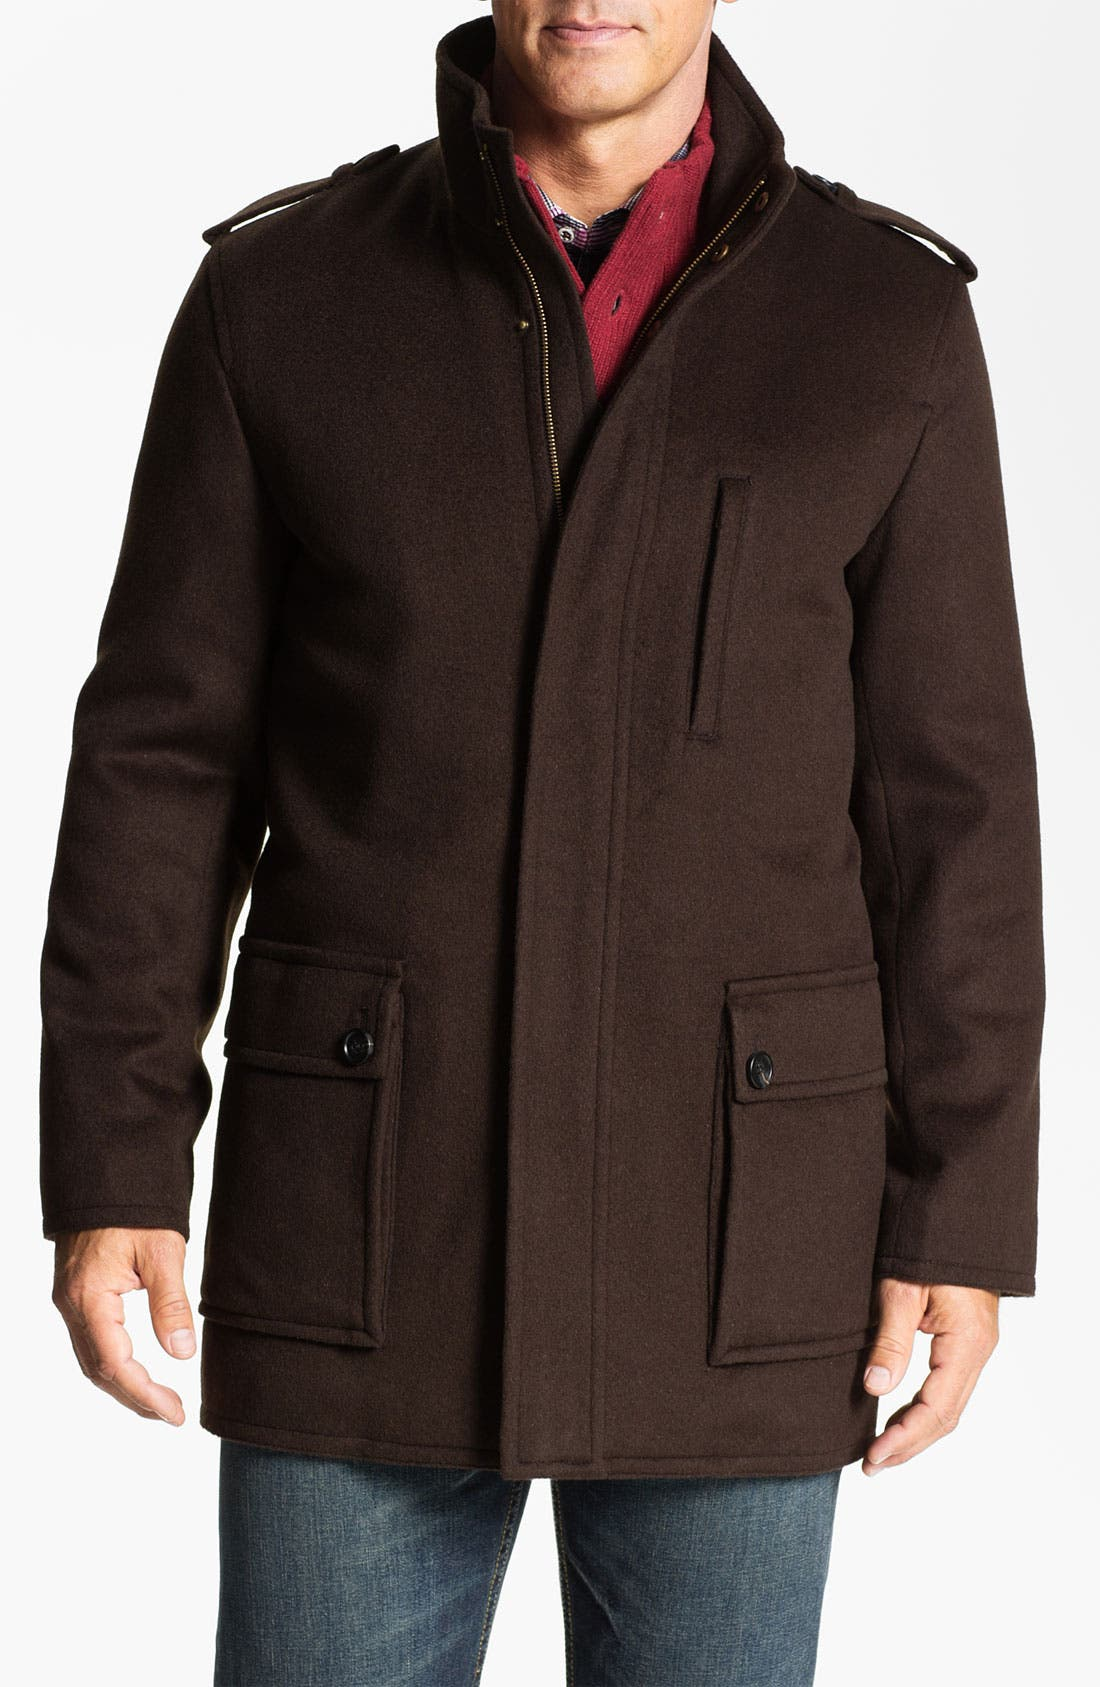 Main Image - Hart Schaffner Marx Wool & Cashmere Jacket